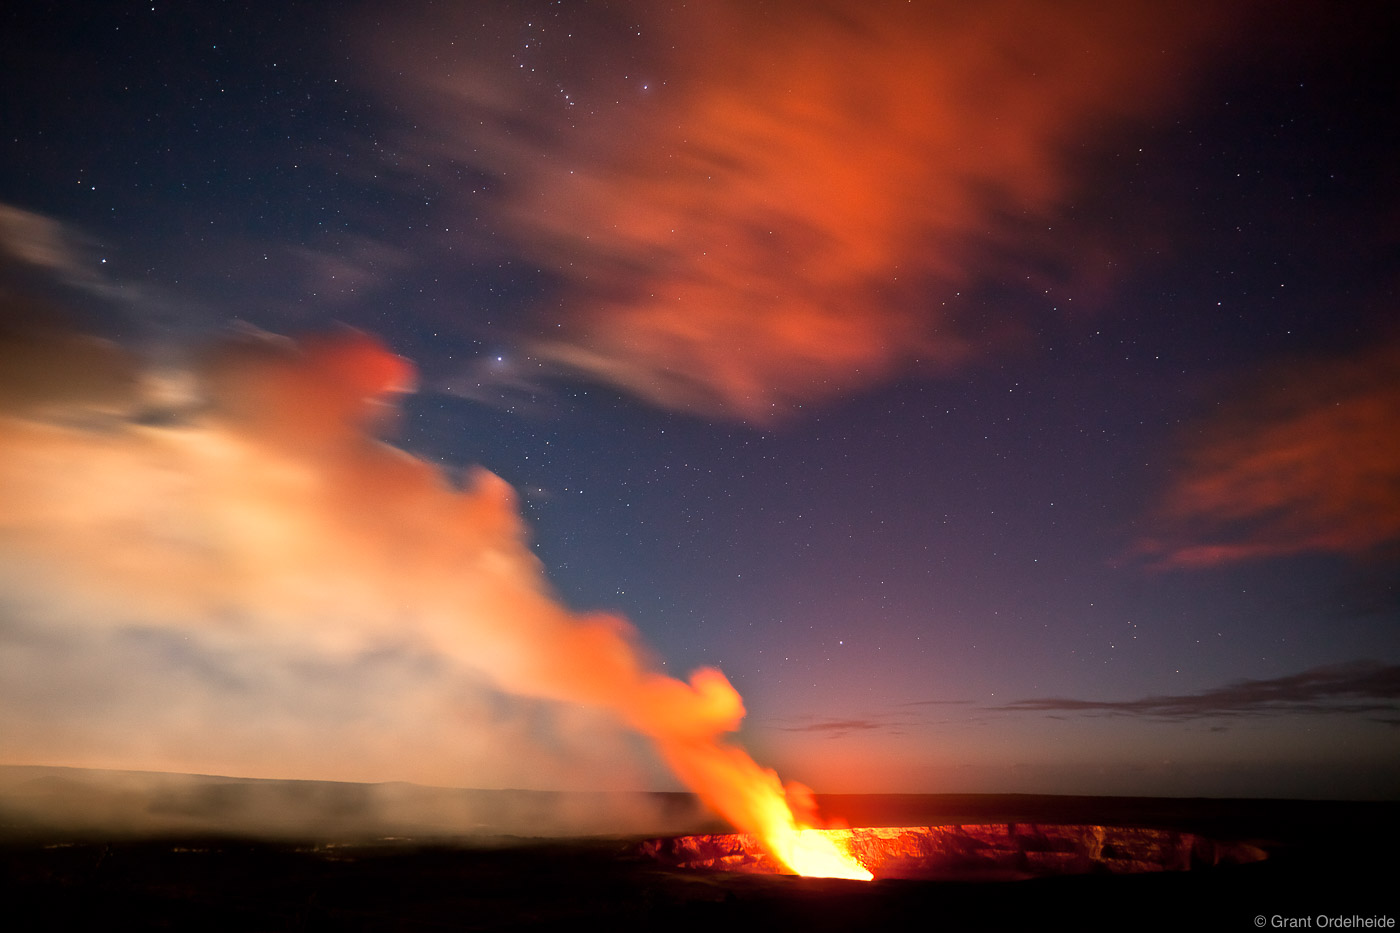 kilauea, crater, volcanoes, national park, glowing, stars, jagger museum, lookout, big island, hawaii, photo